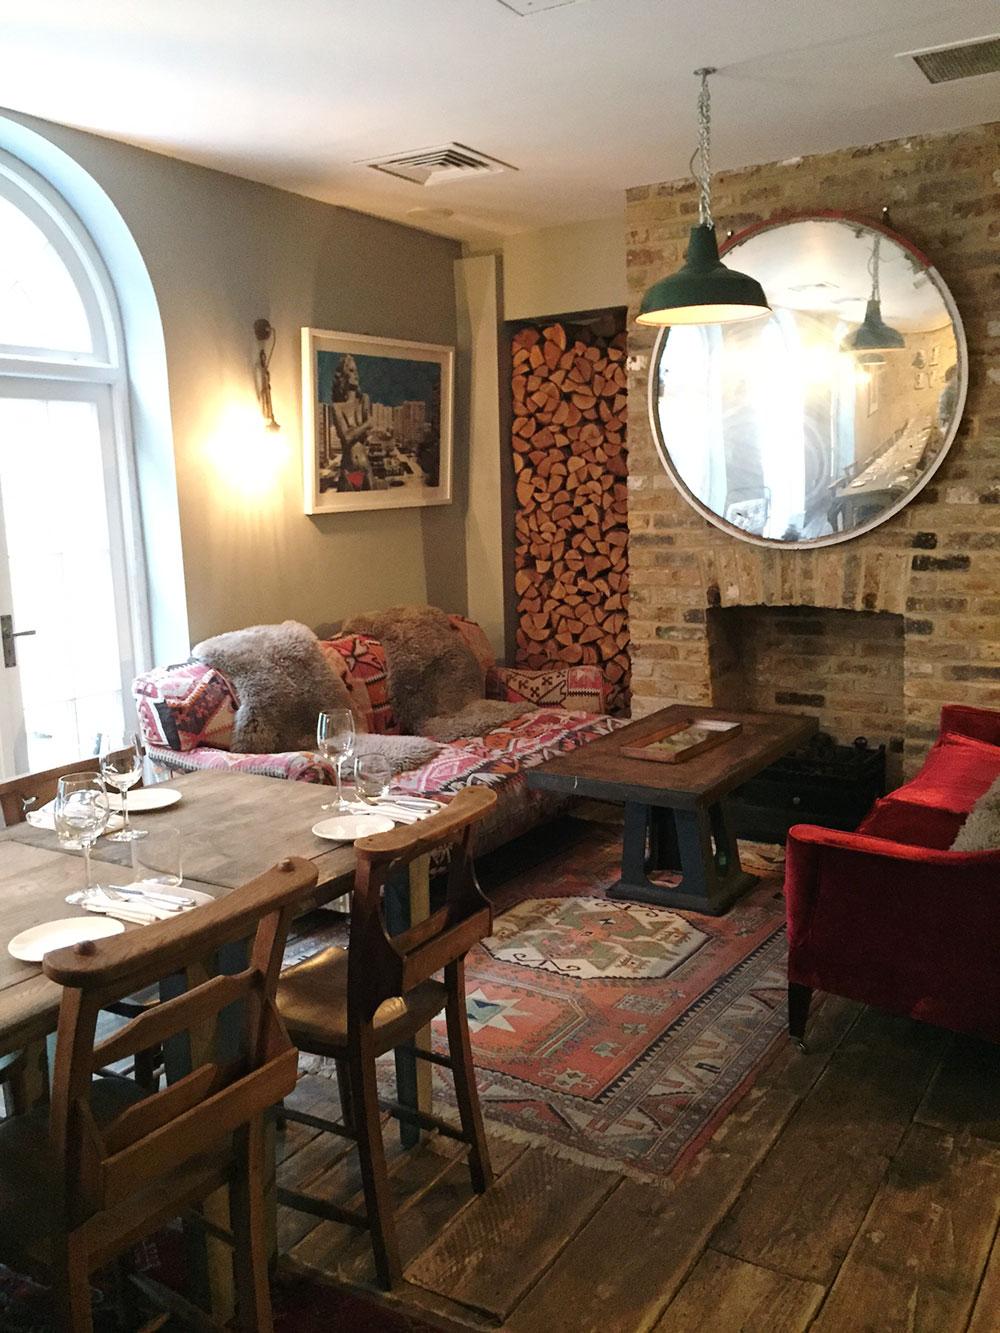 RosyCheeks-Artist-Residence-London-partyroom